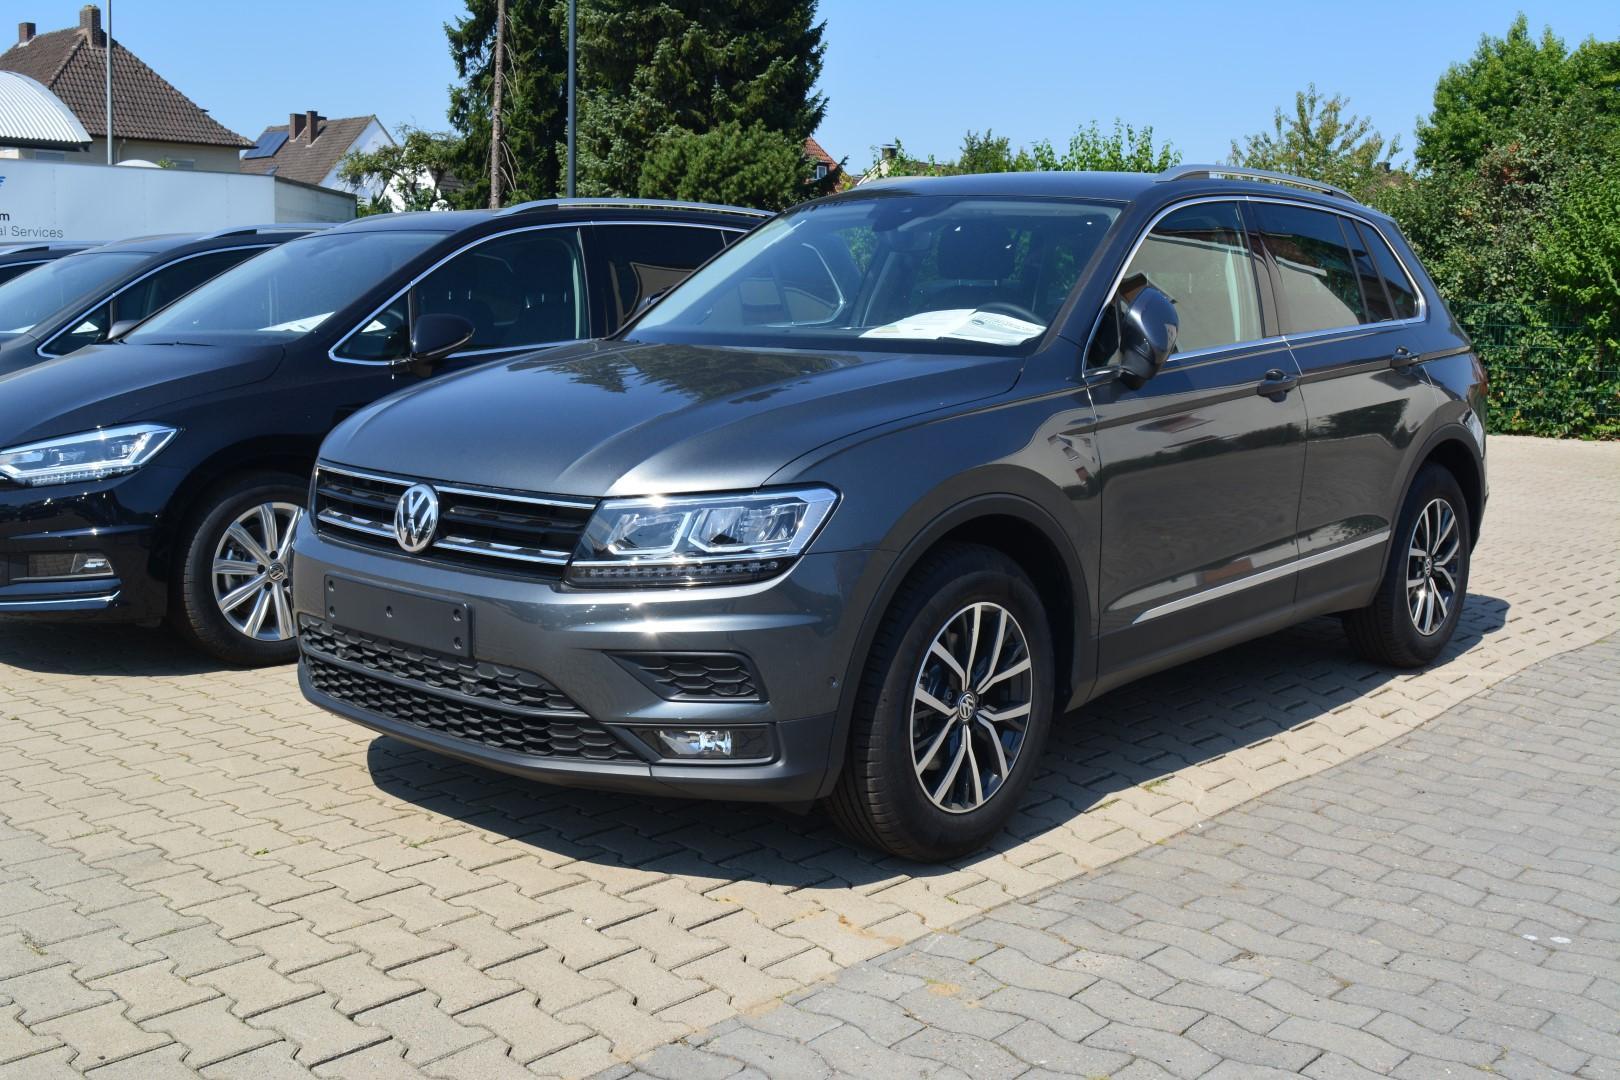 VW Tiguan EU Neuwagen Lagerfahrzeug